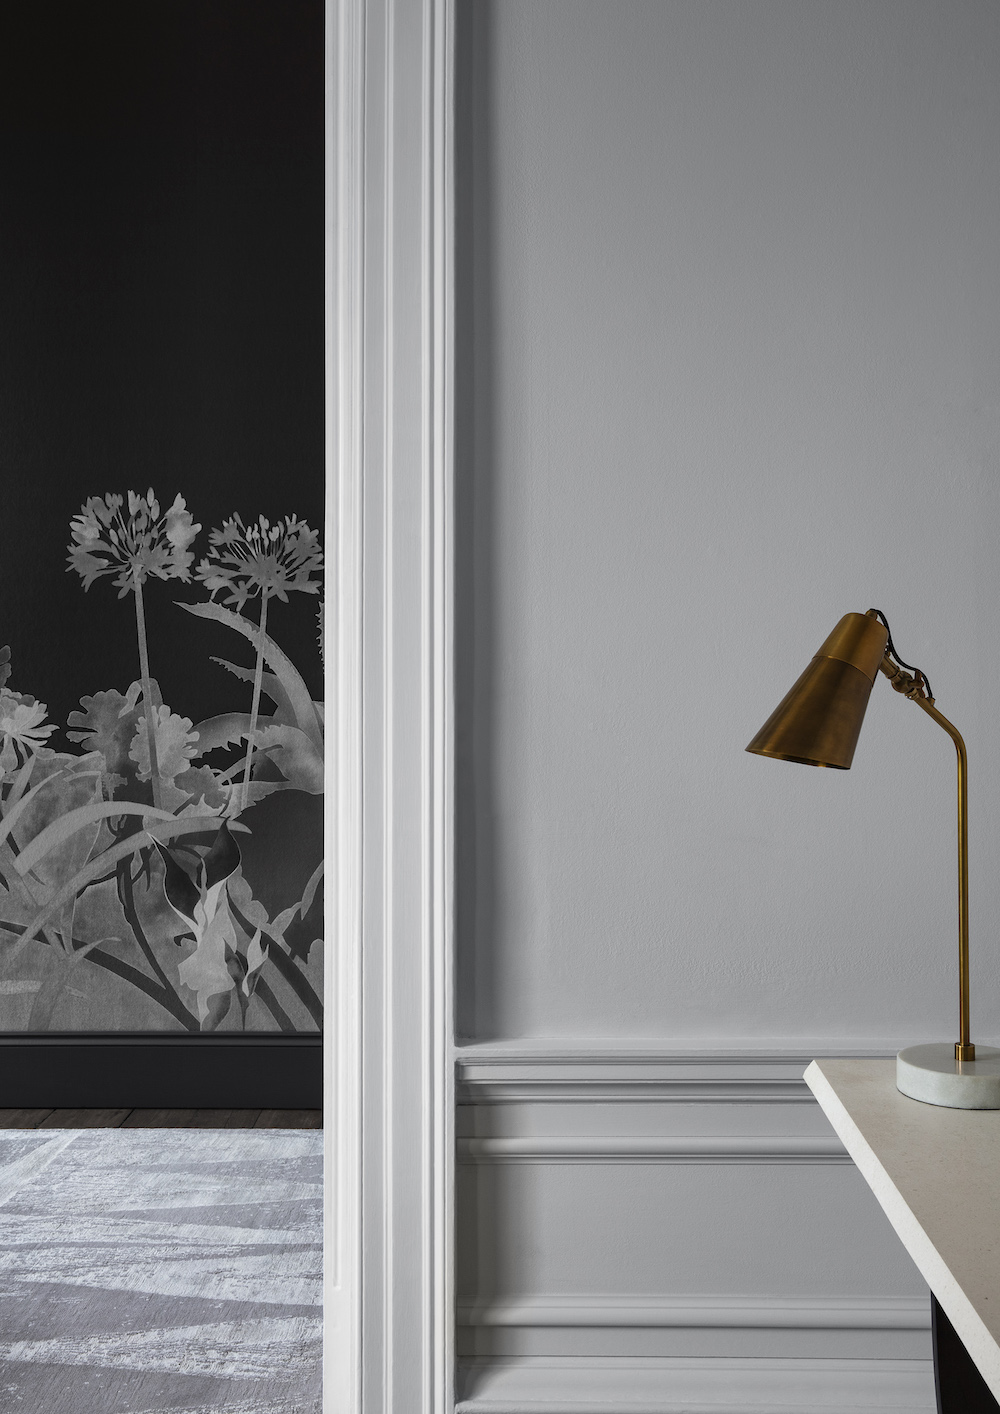 Rustgevende neutrale kleuren geven interieur harmonie